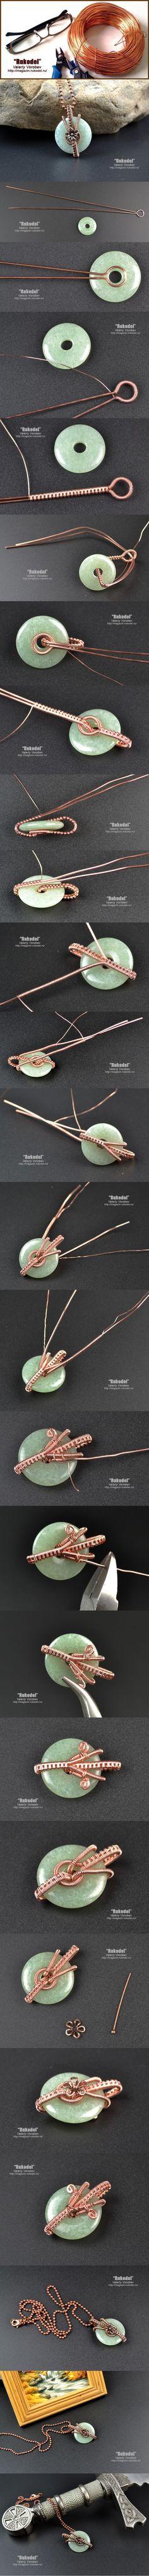 Украшения из натуральных камней. | Рукодел. Wire Wrap Pendant #wirejewelry